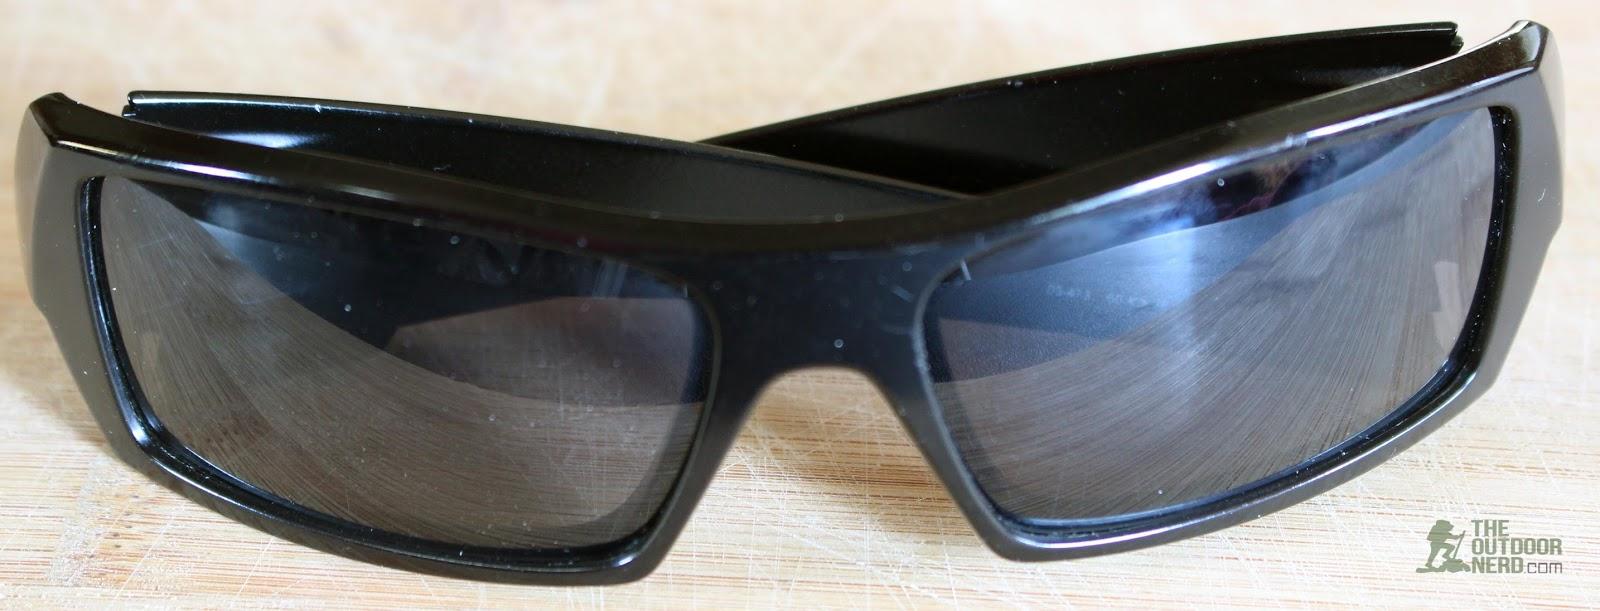 26ac2600ce Walleva Replacement Lenses For Oakley GasCan Sunglasses - Black Lenses